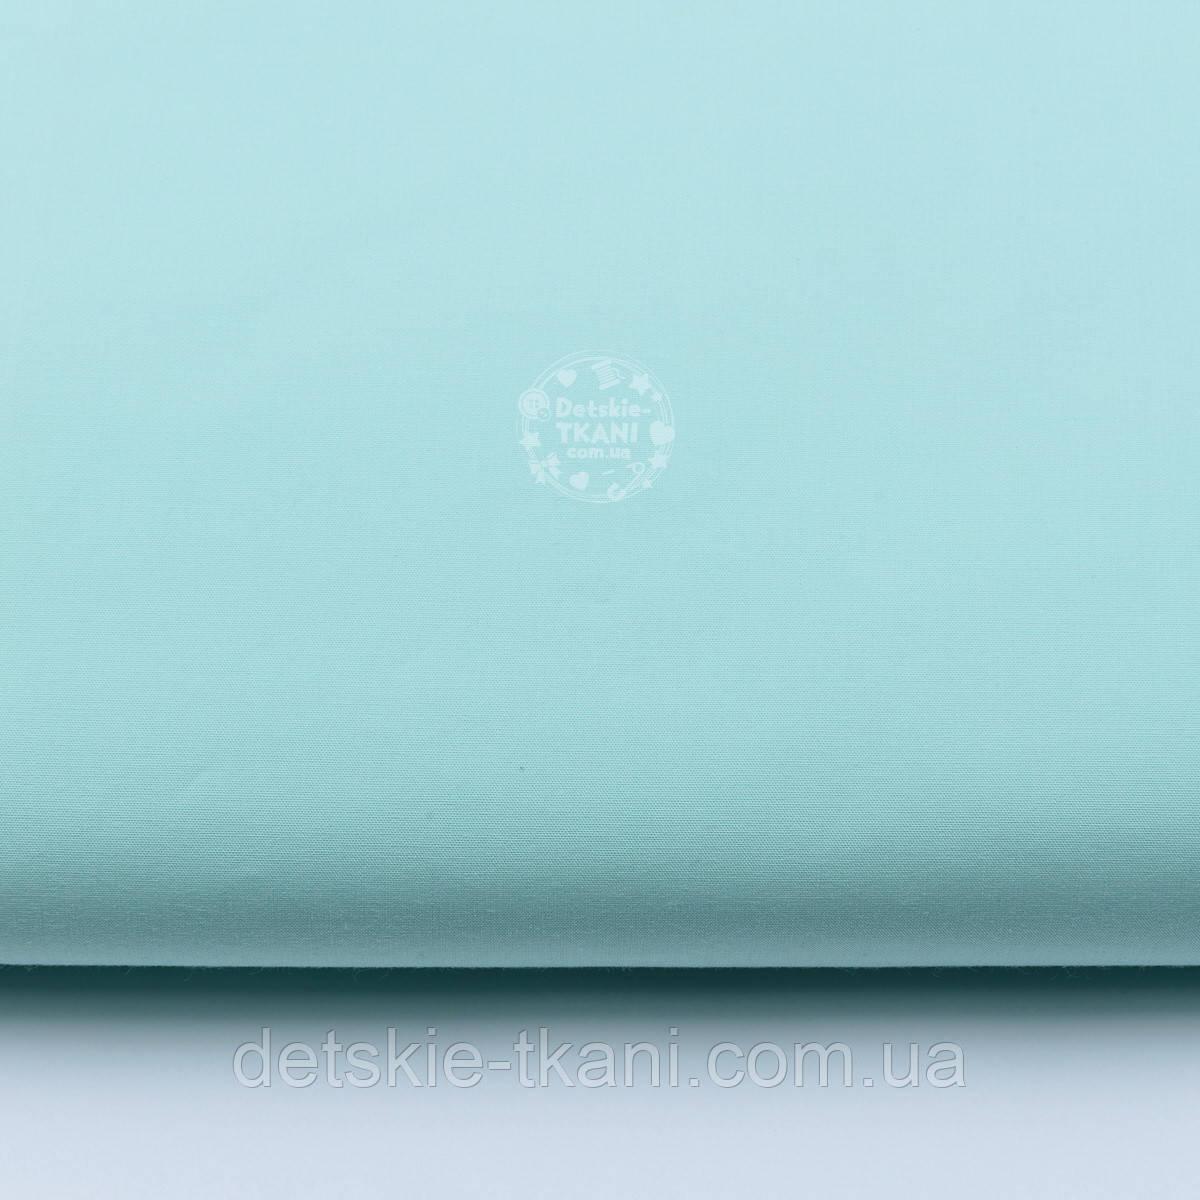 Лоскут ткани №343м Mist мятного цвета